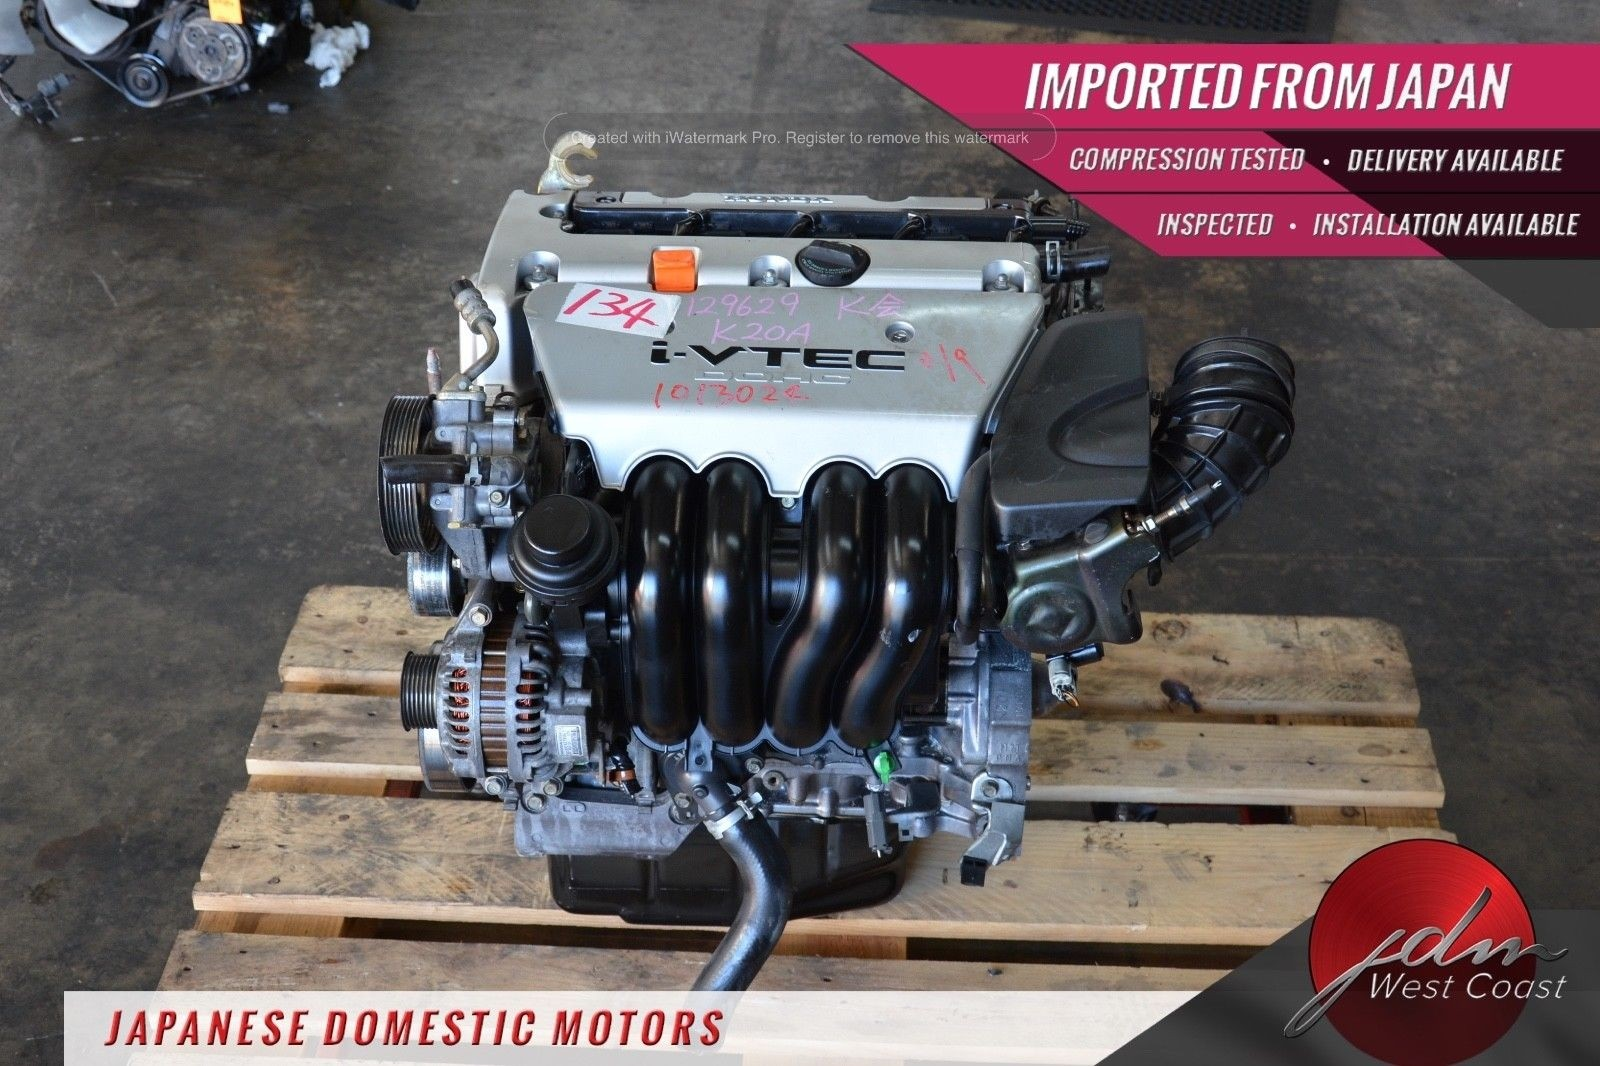 JDM Honda K20a Engine 2.0L Acura Rsx Base 02-04 DOHC Civic Si EP3 02-05 I-VTEC